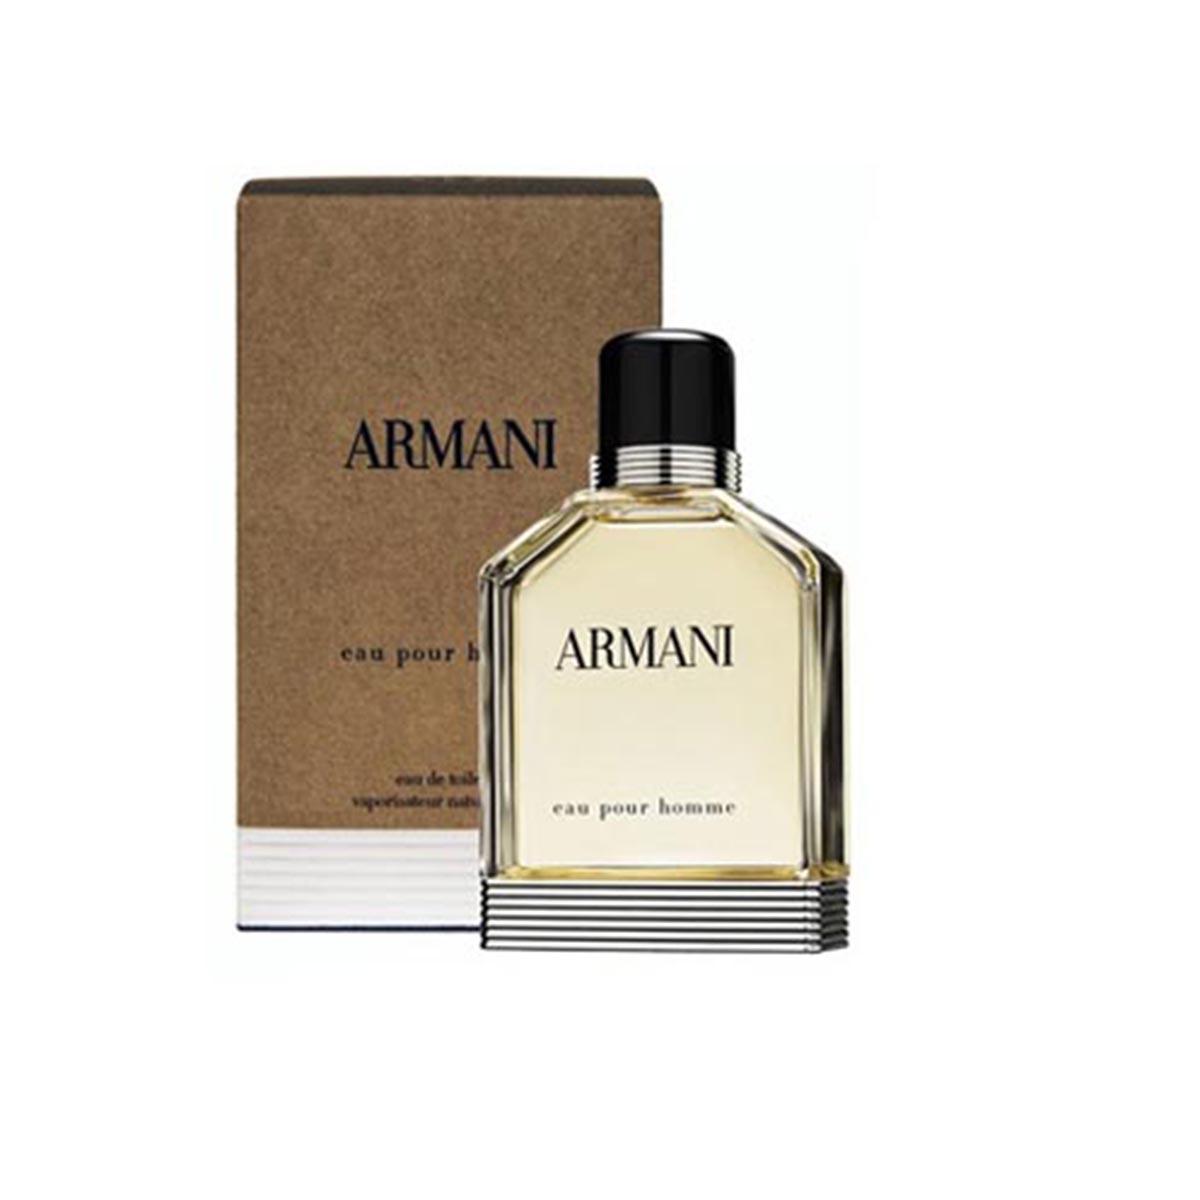 Giorgio armani pour homme eau de toilette 100ml vaporizador